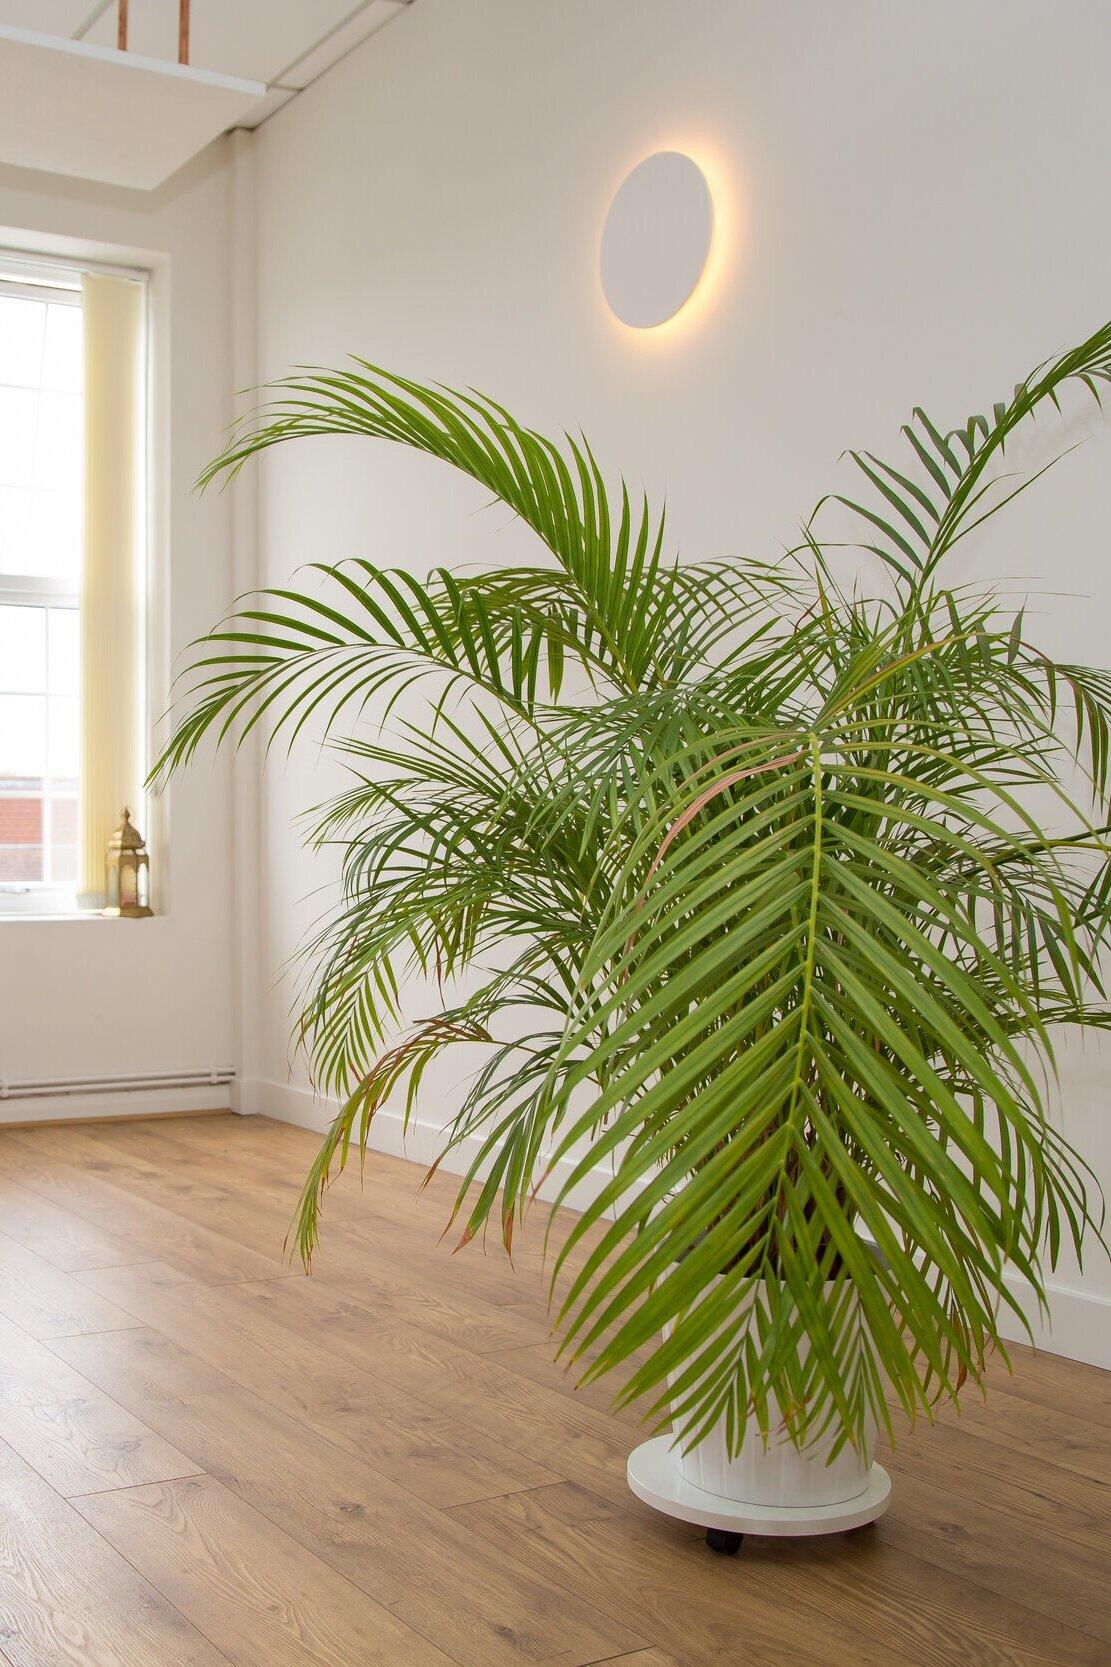 Tropical plants thrive in Sun studio